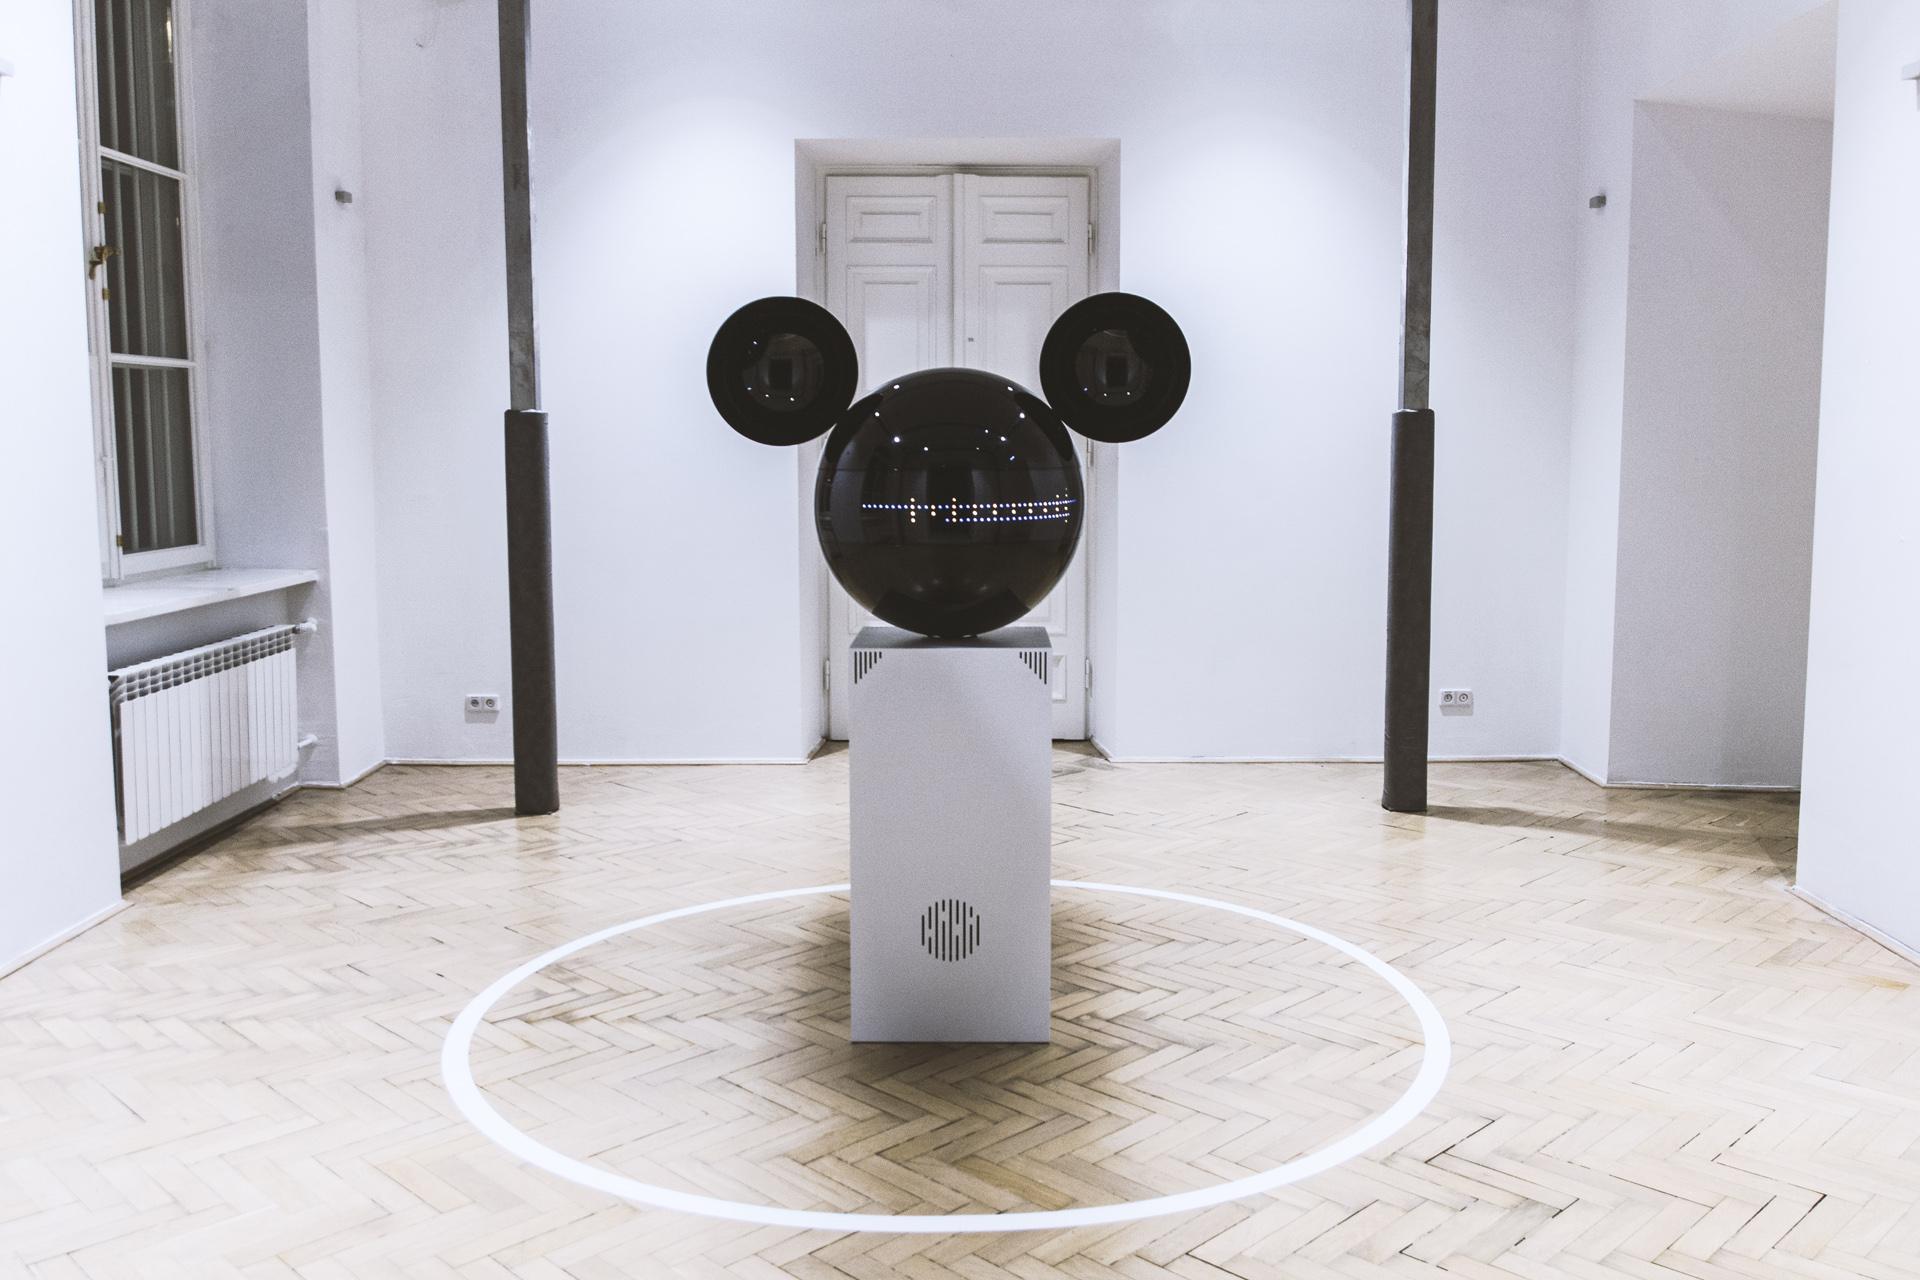 Mickeyphon_panGenerator (4)